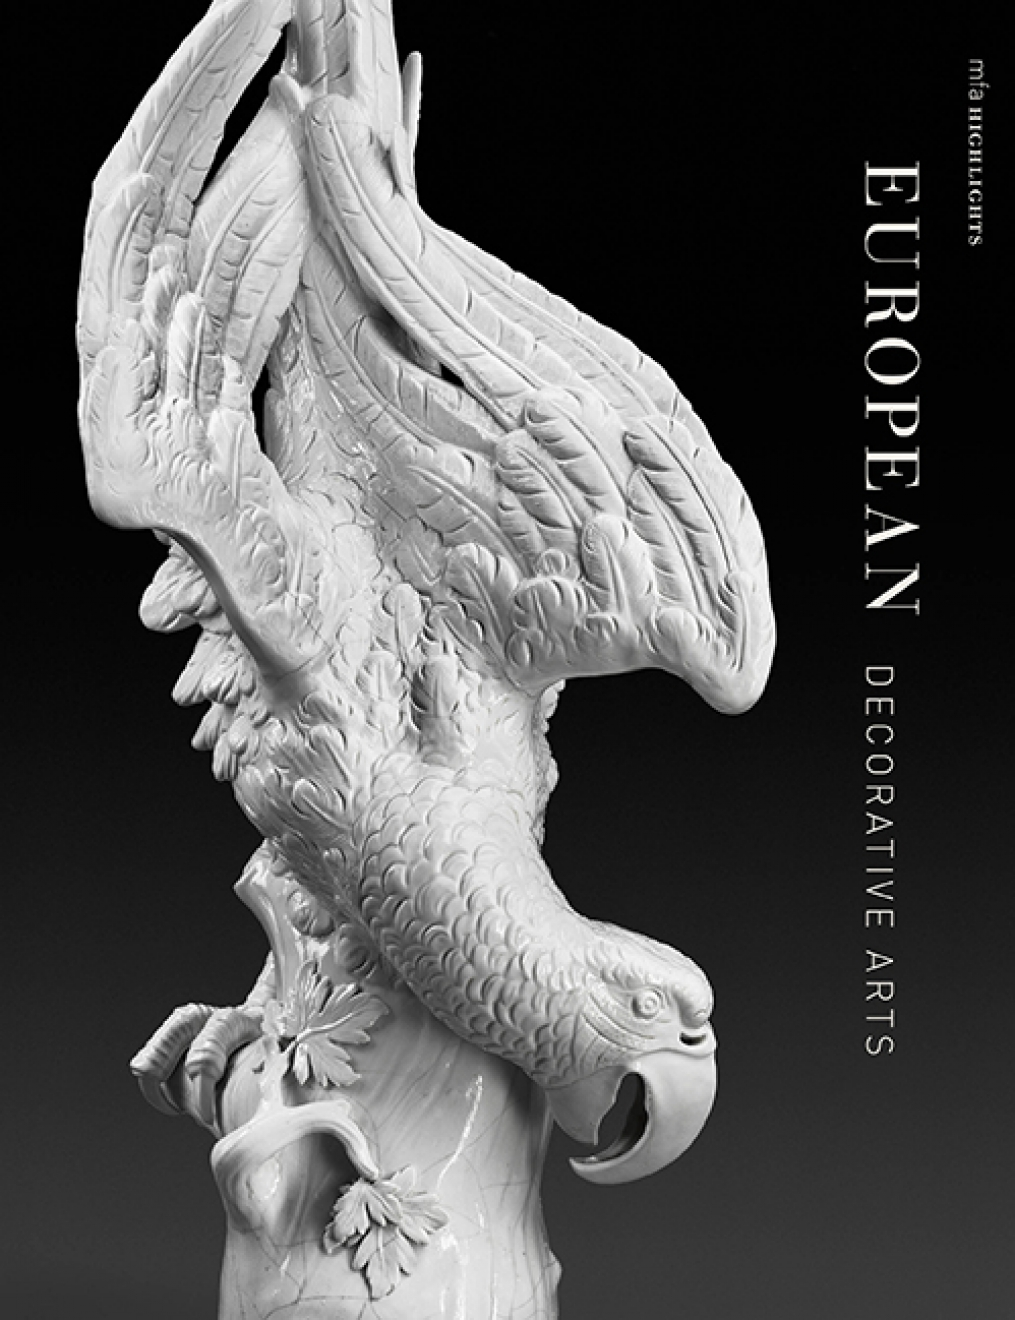 European Decorative Arts cover